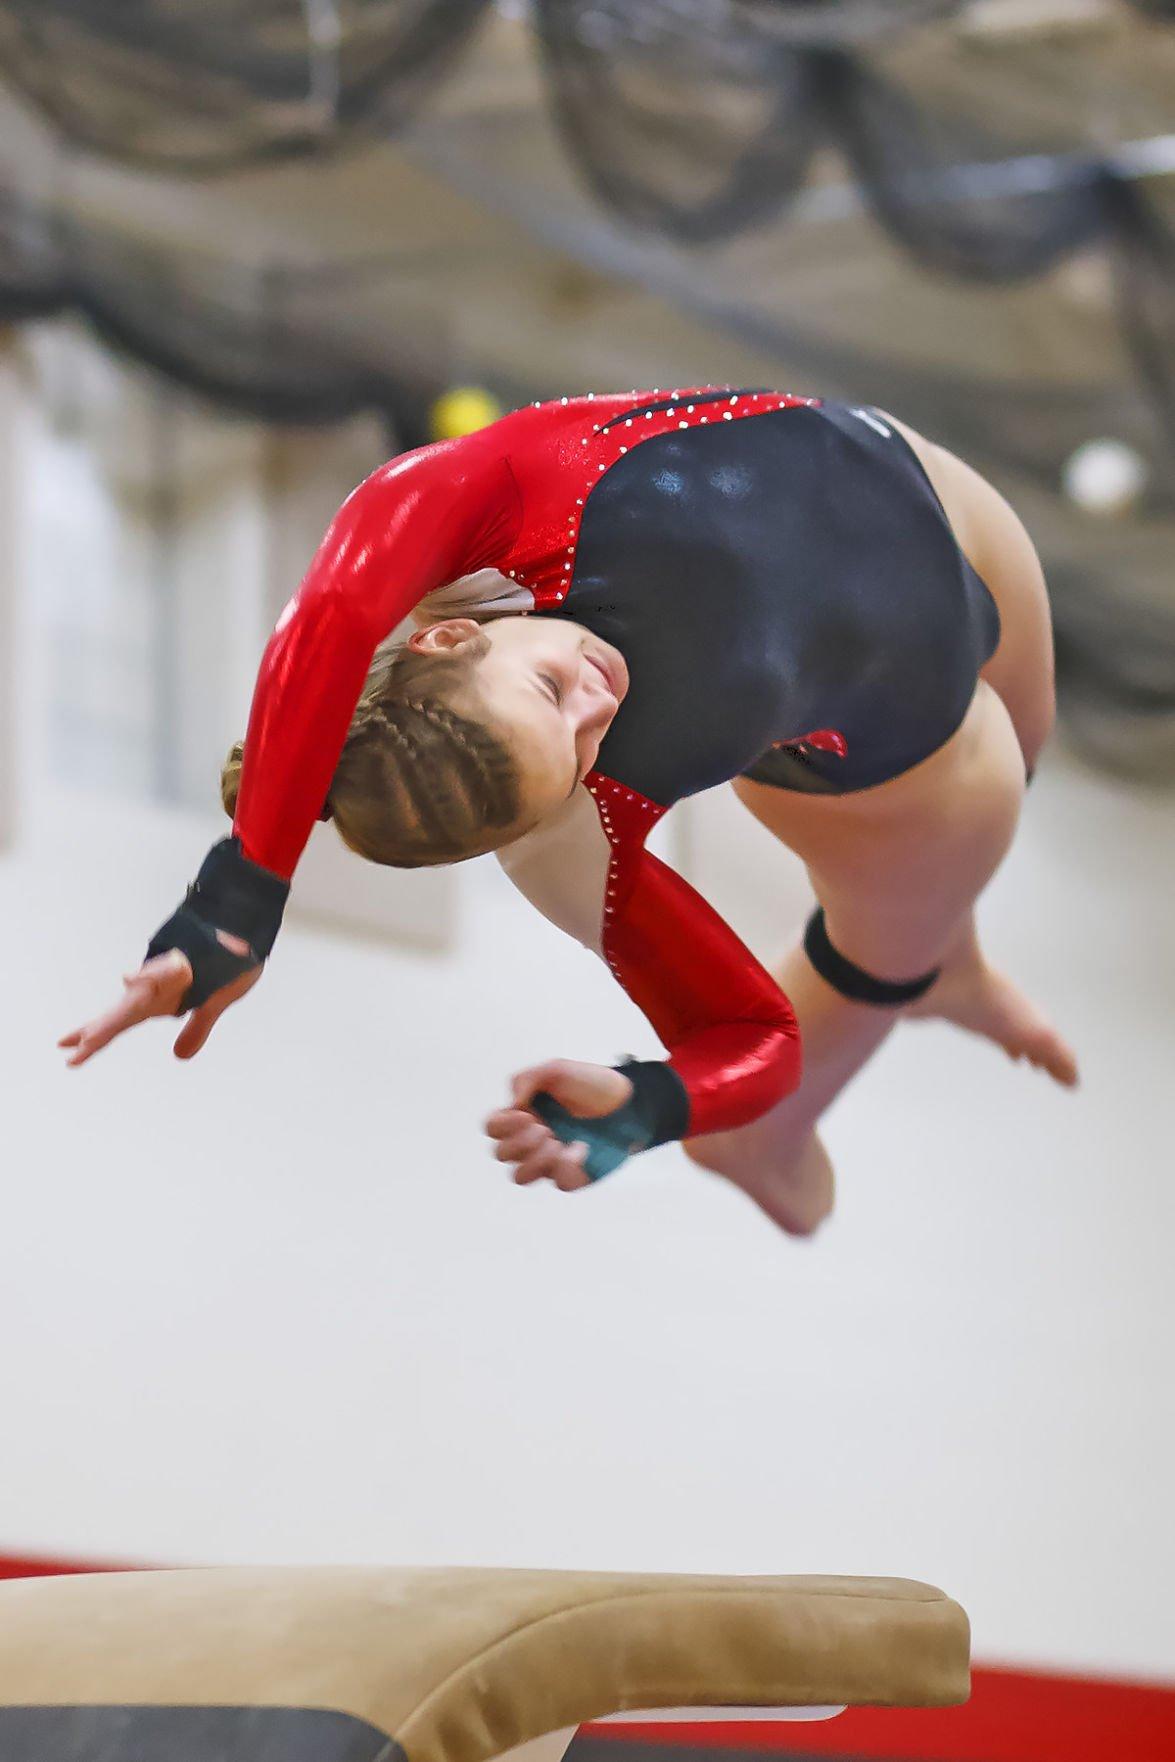 westby gymnasts gain valuable experience westbynorsemen gymnastics bekah dwyer valult